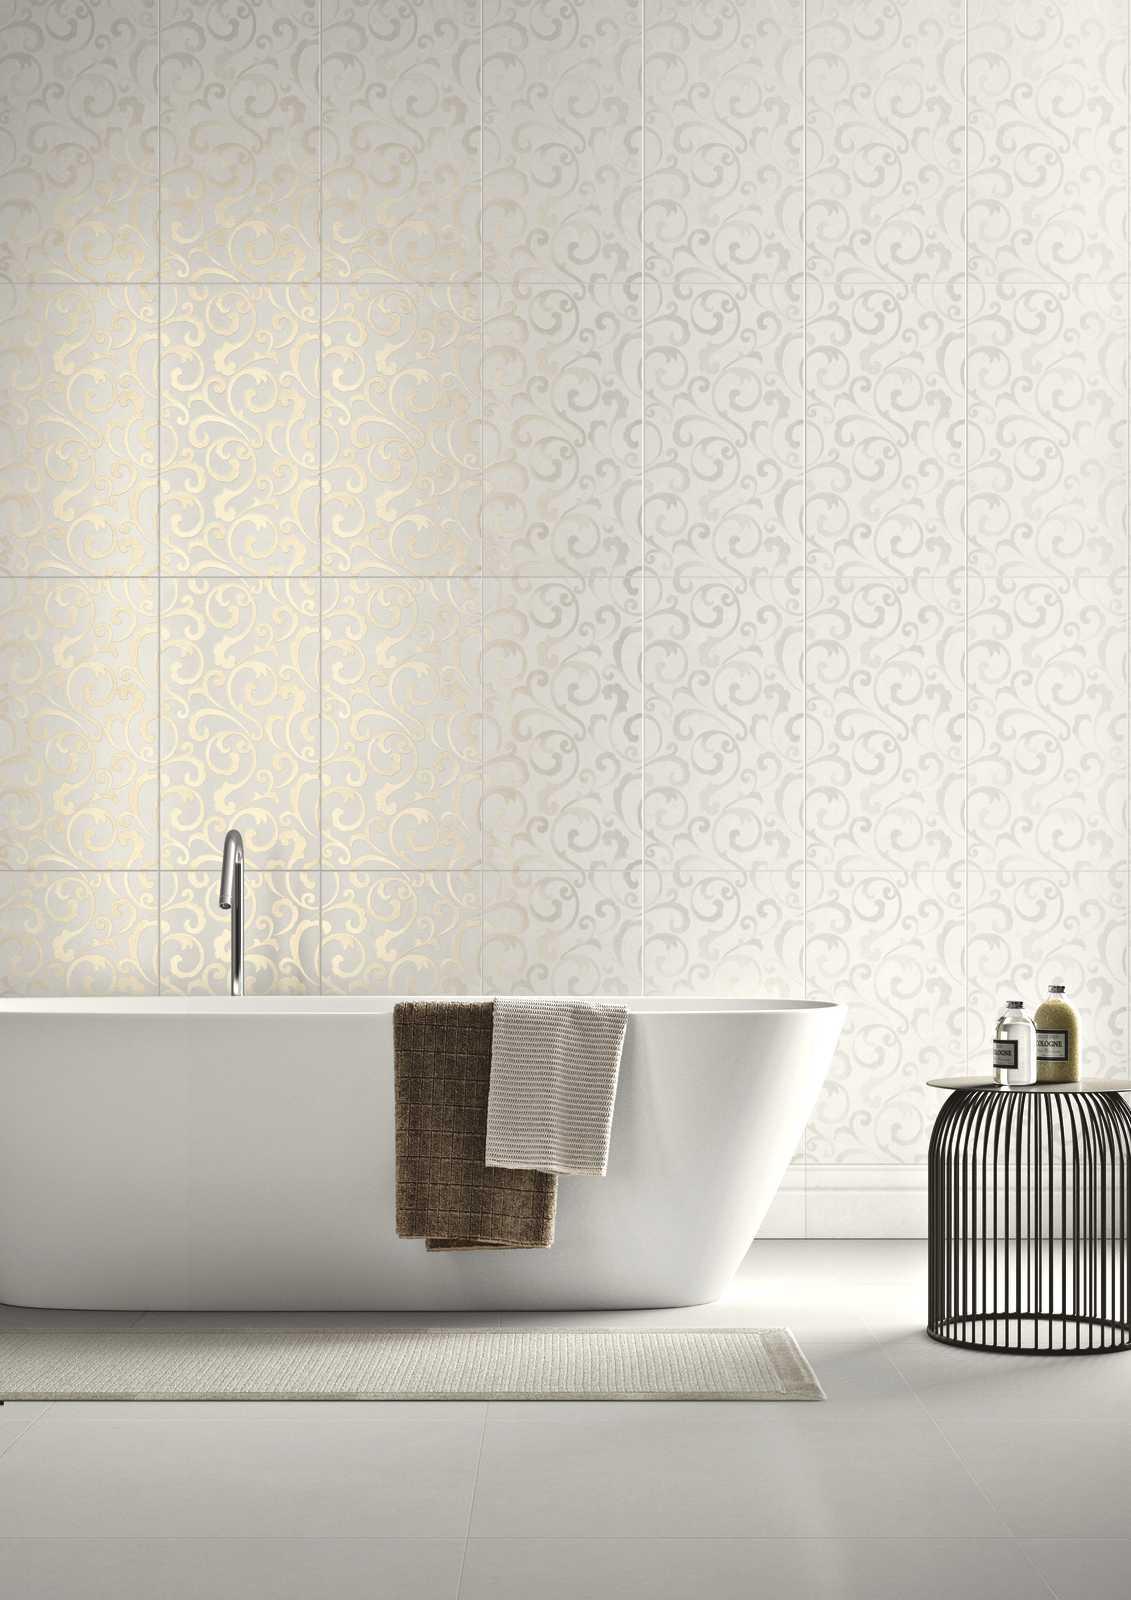 Pietra di noto porcelain stoneware flooring marazzi pietra di noto ceramic tiles marazzi4224 dailygadgetfo Choice Image